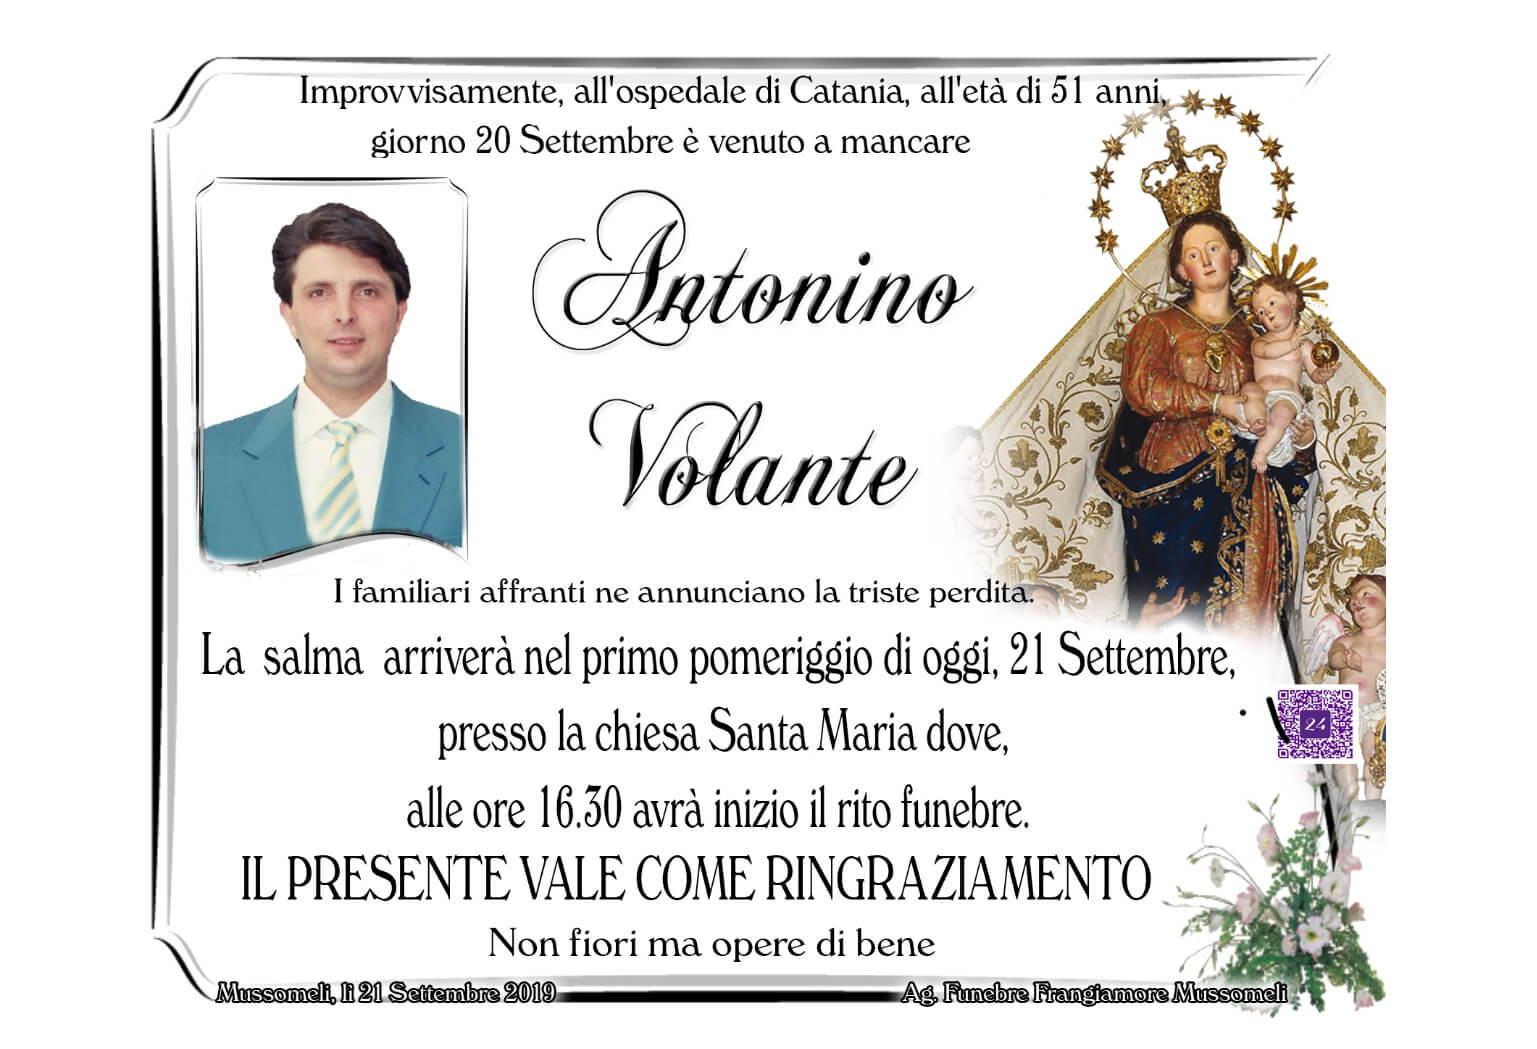 Antonino Volante